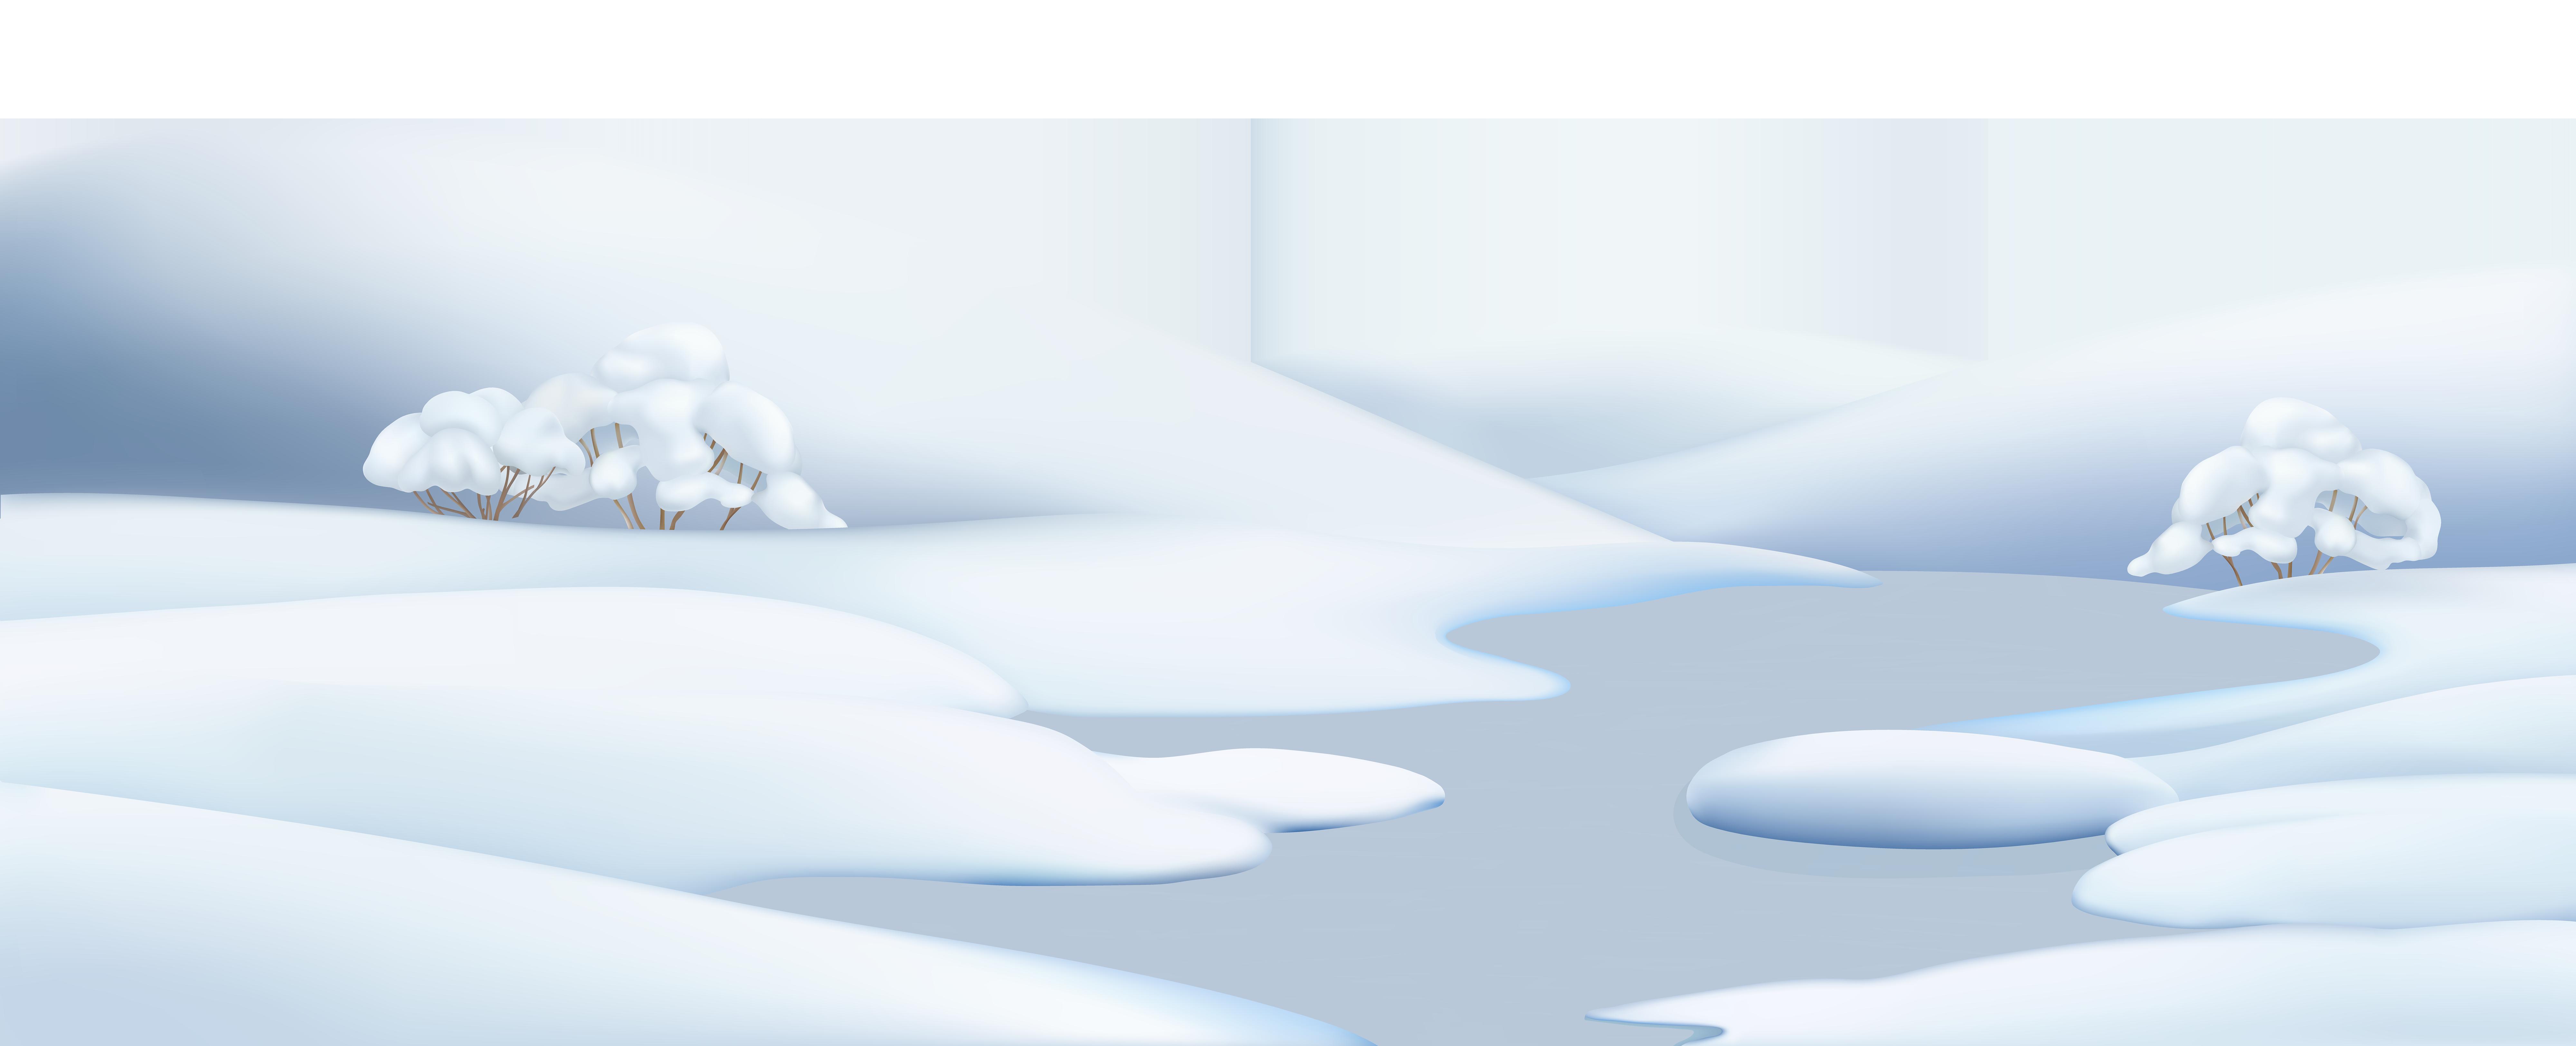 Clipart snow light snow. Clip art winter ground